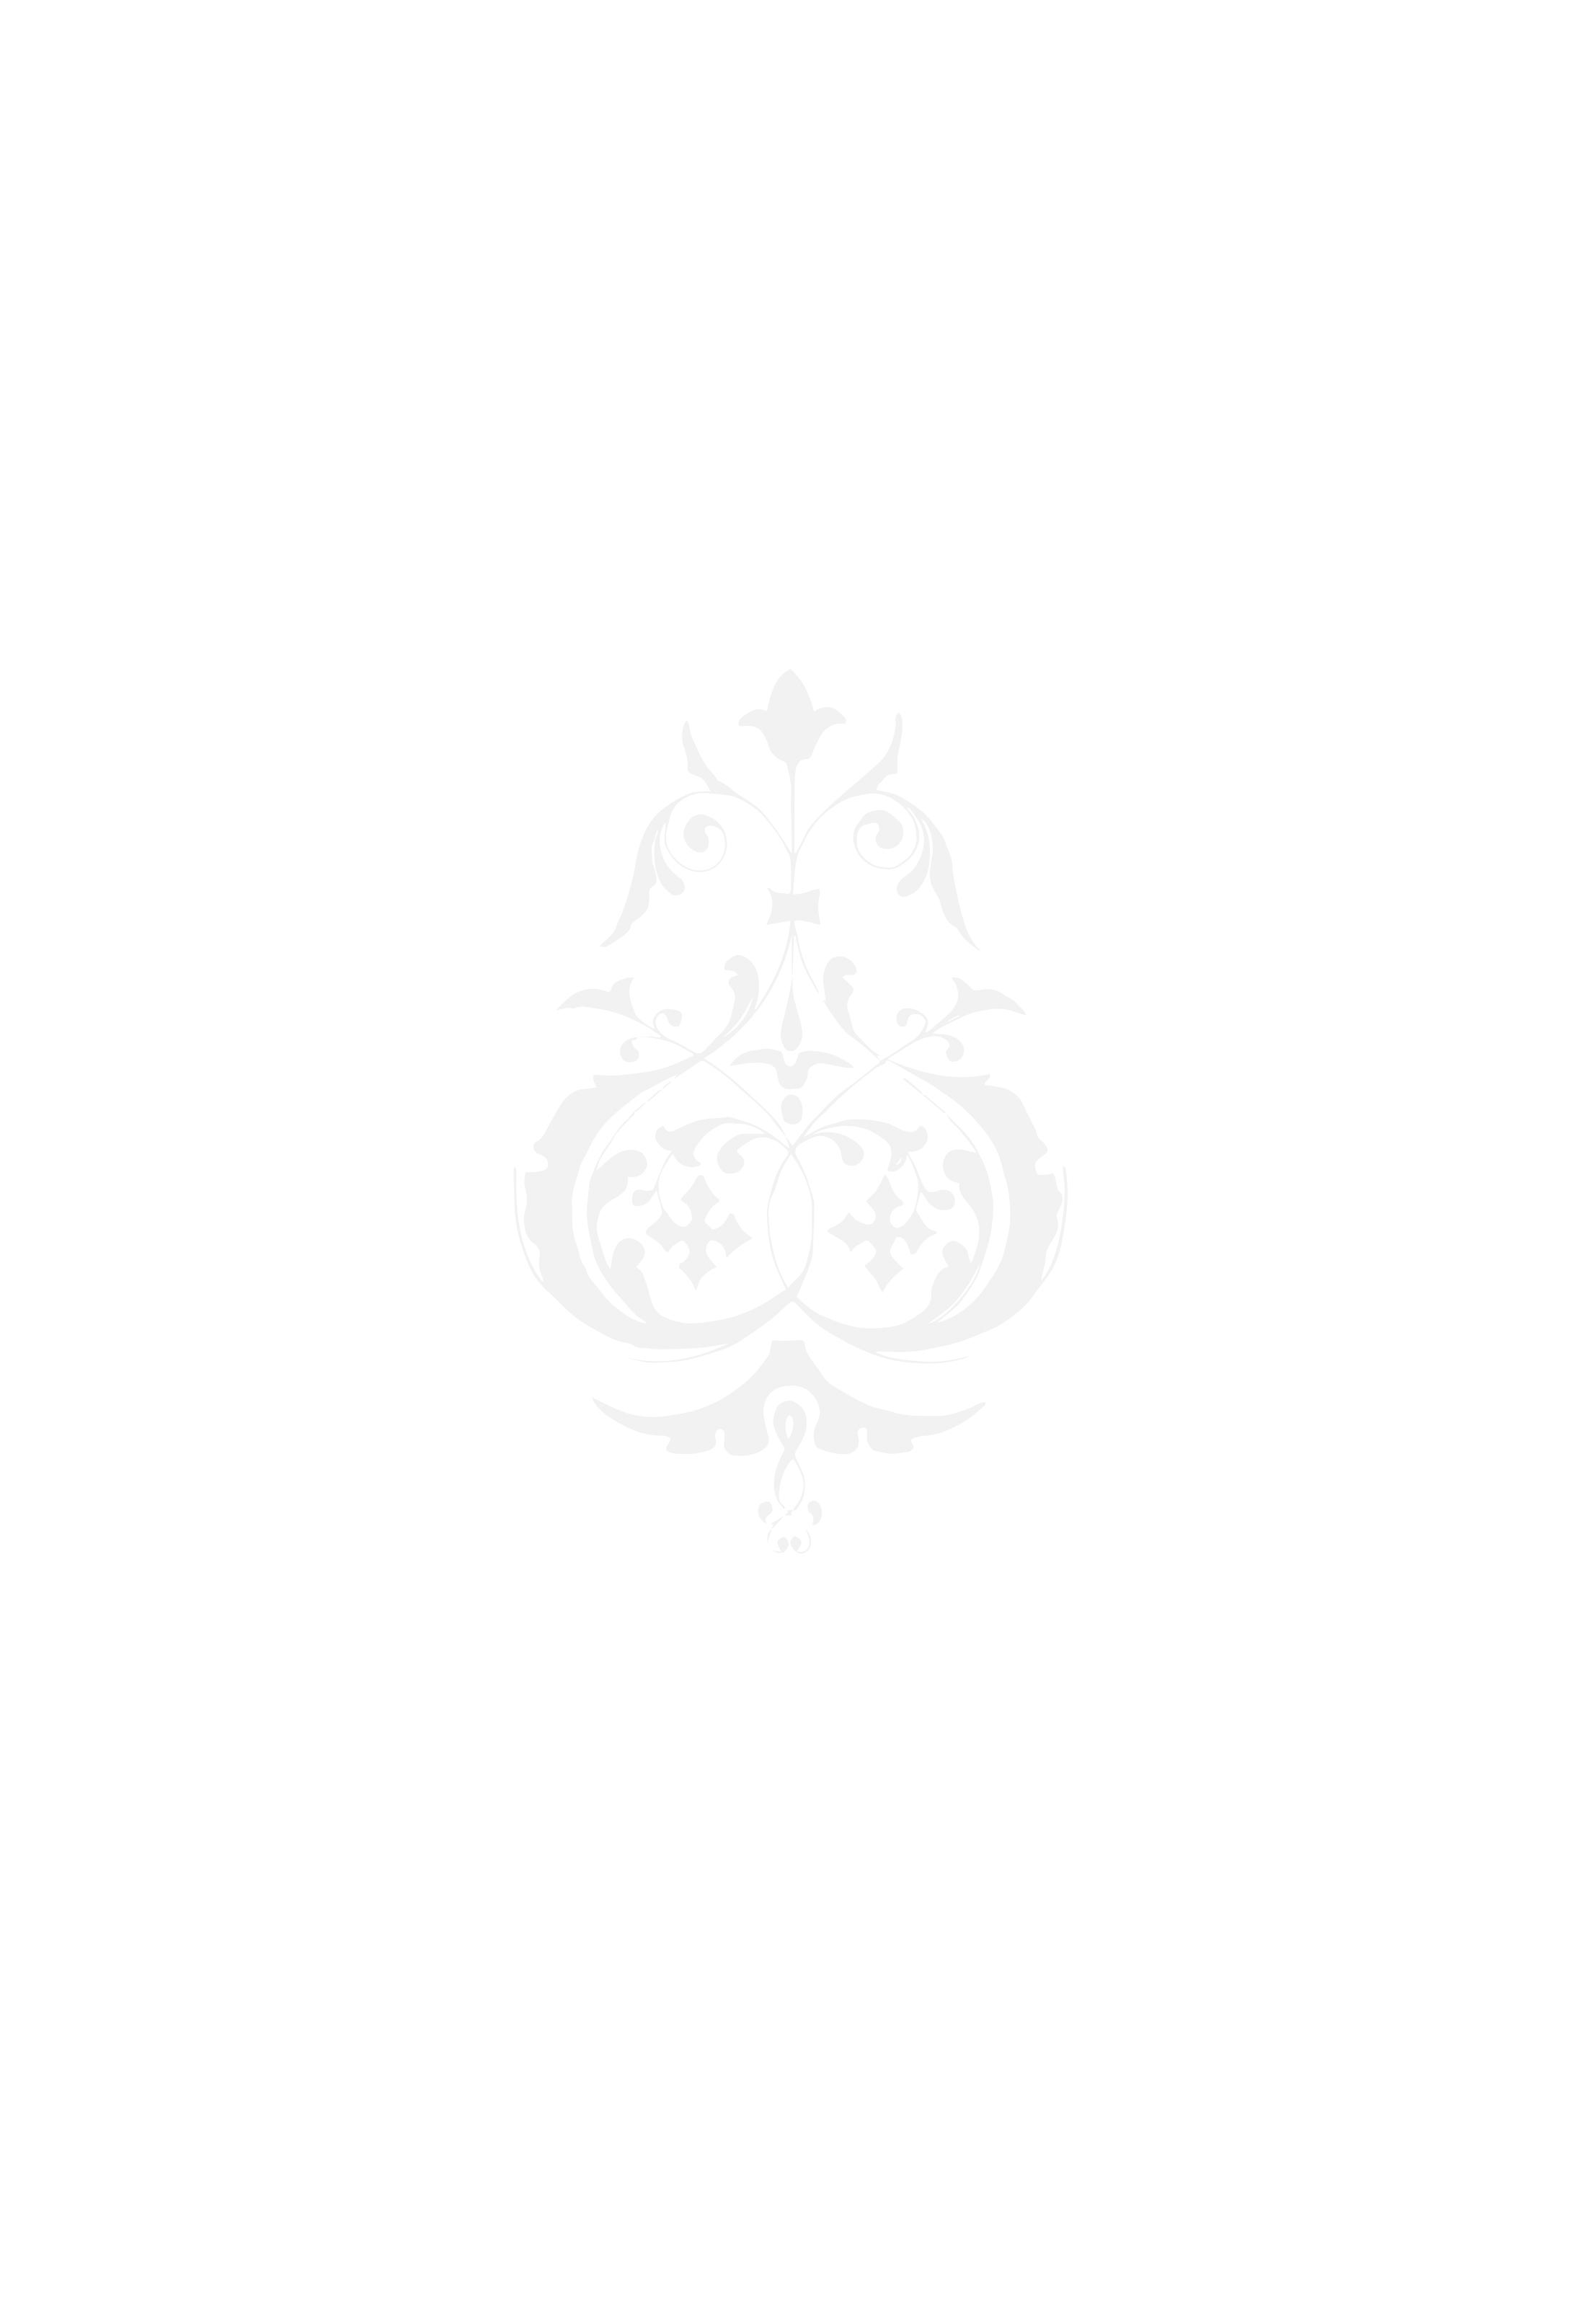 Arabesque-Gold-Tablecloth-Detail.jpg